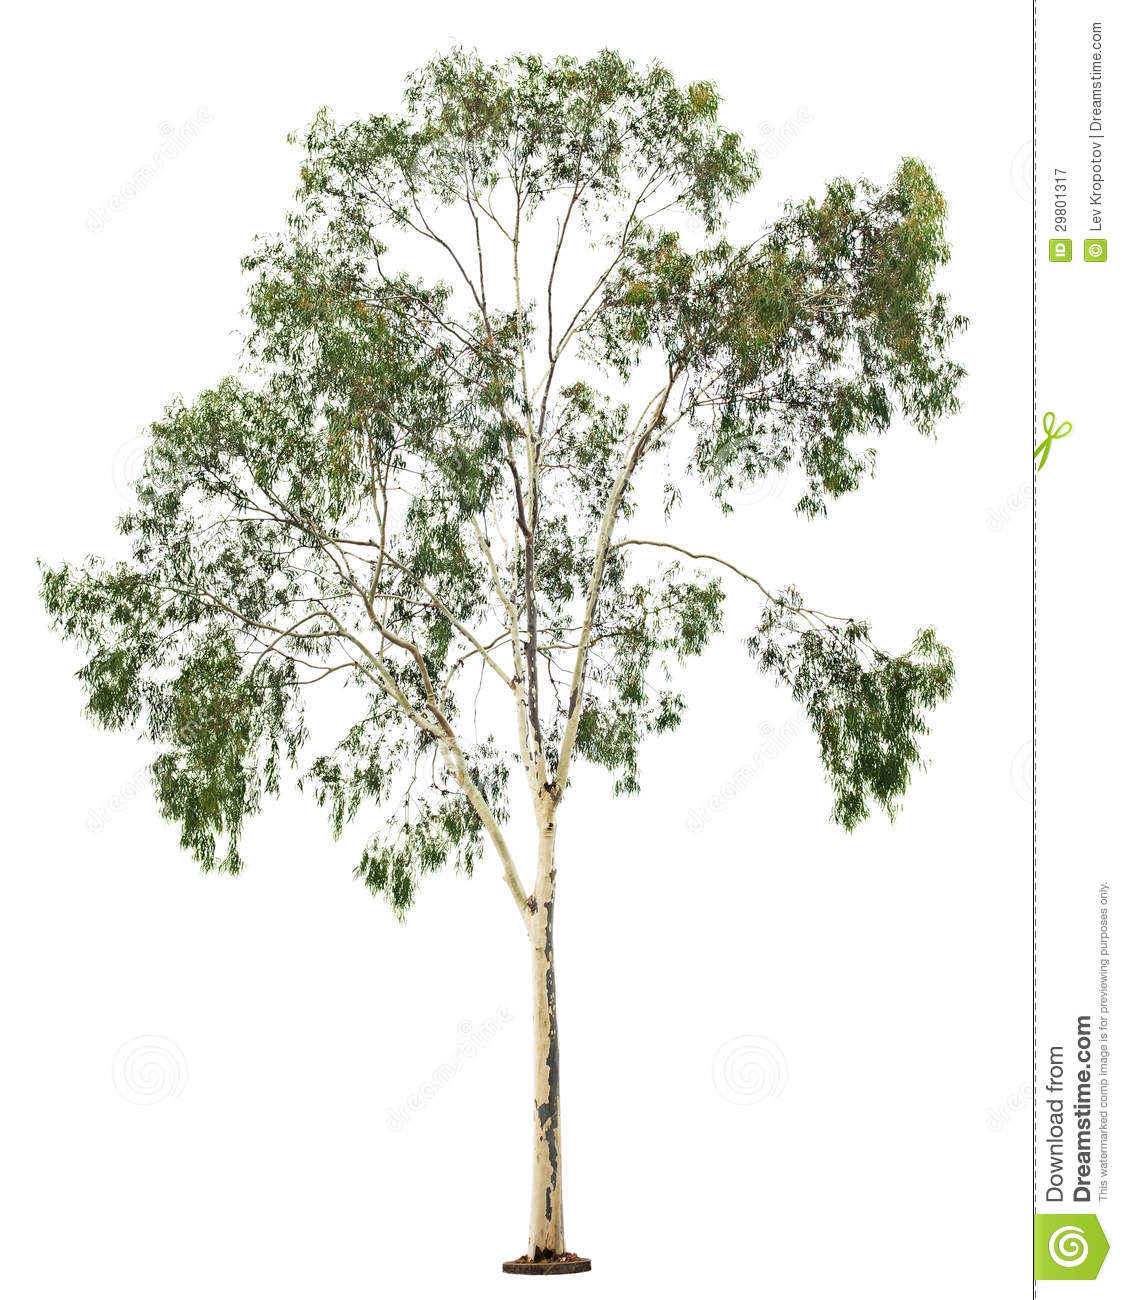 Eucalyptus Gum Tree clipart #14, Download drawings